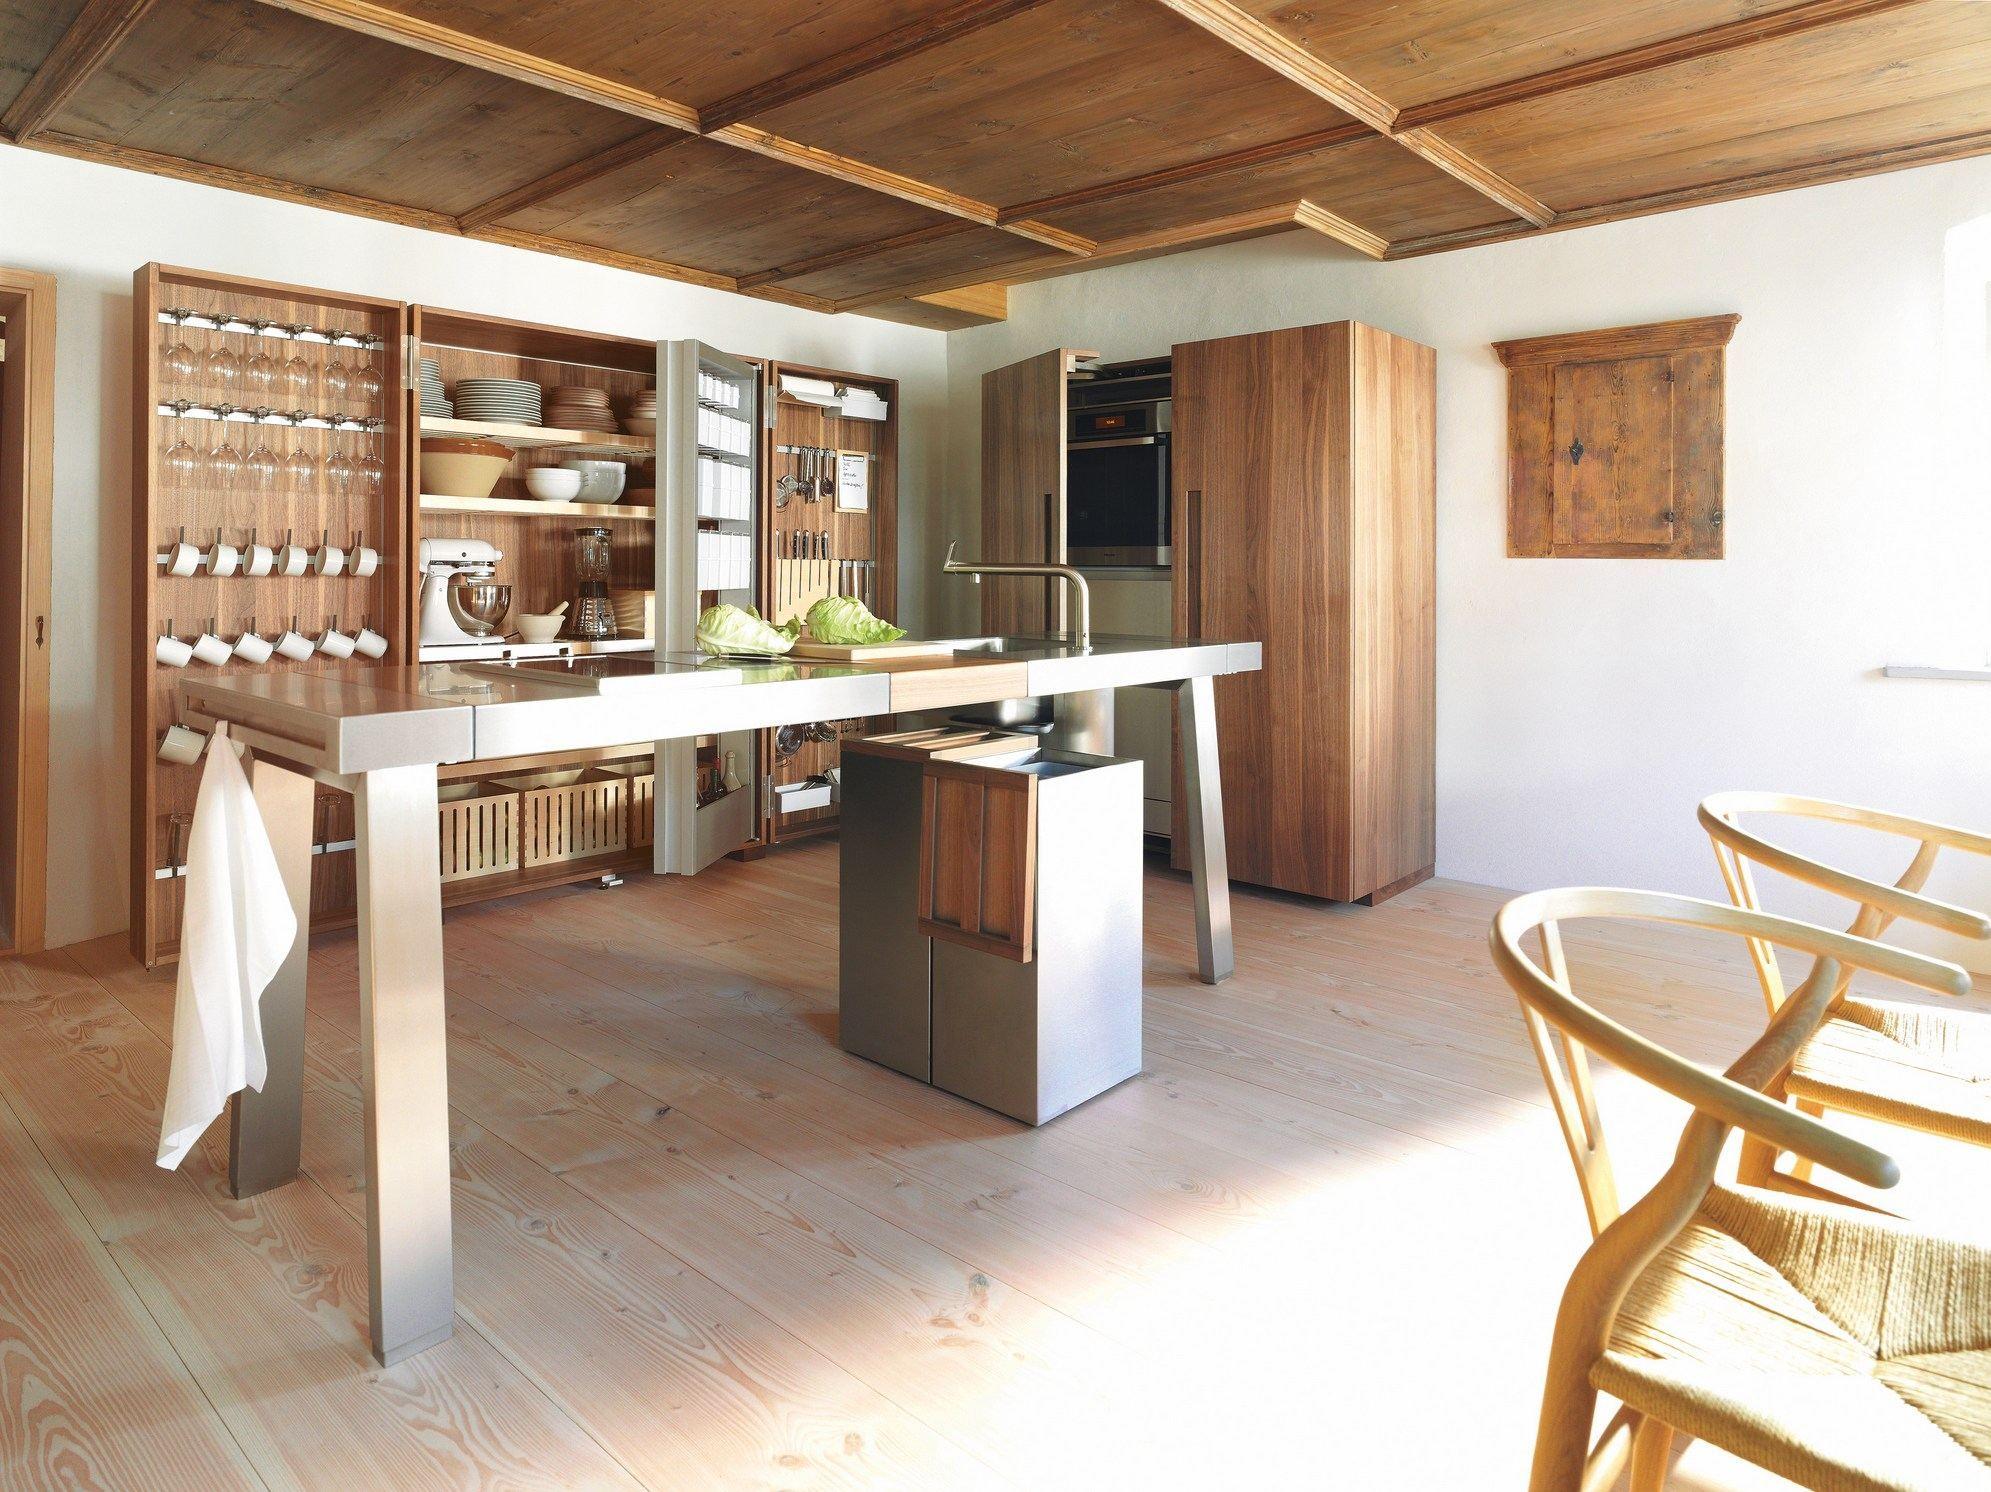 Cuisine Integree B2 By Bulthaup Design Eoos Dream Home Pinterest